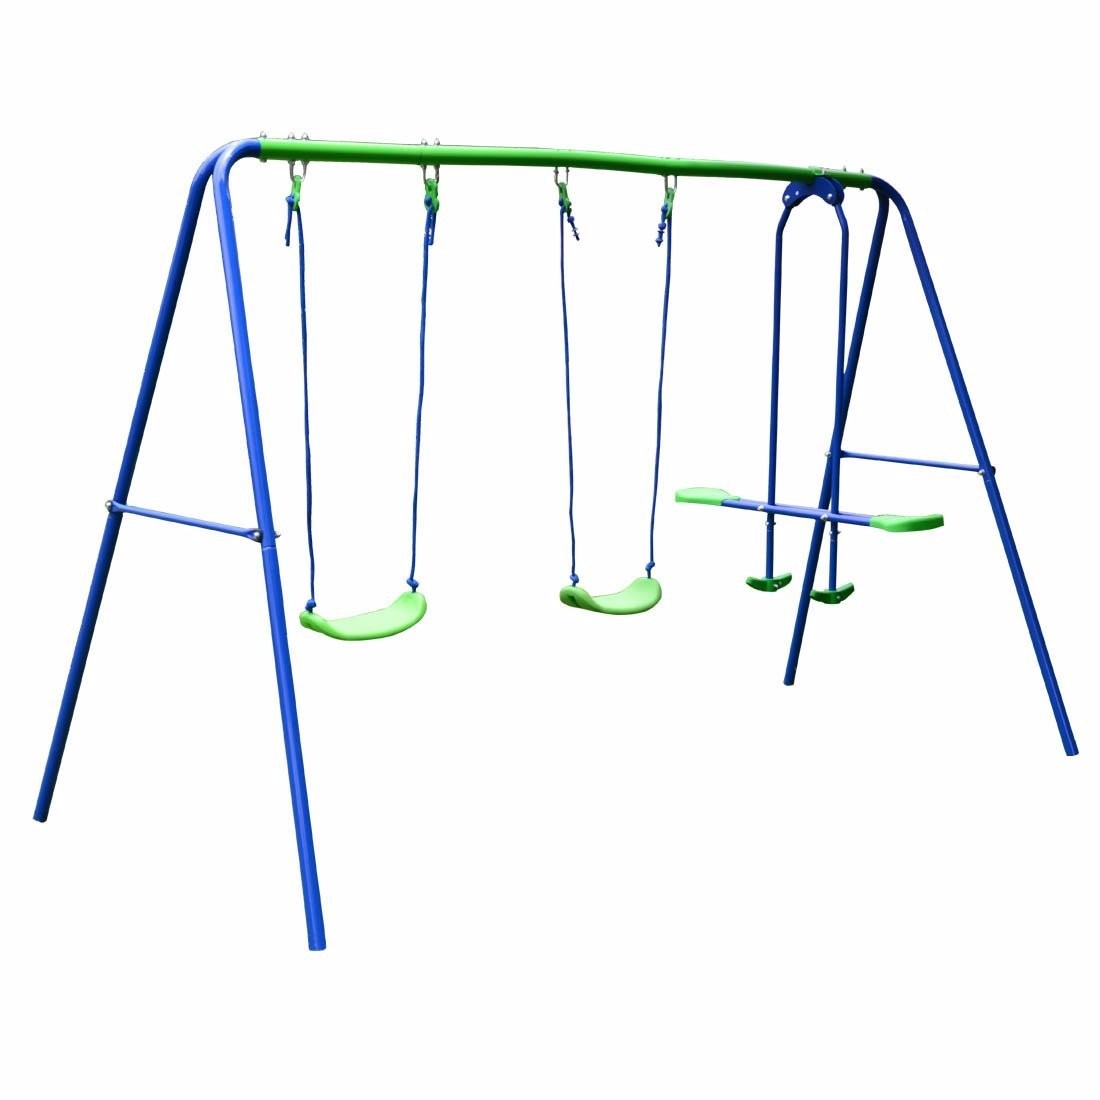 Columpio de acero juego hasta 4 ni os juguetes para jard n for Columpio balancin jardin